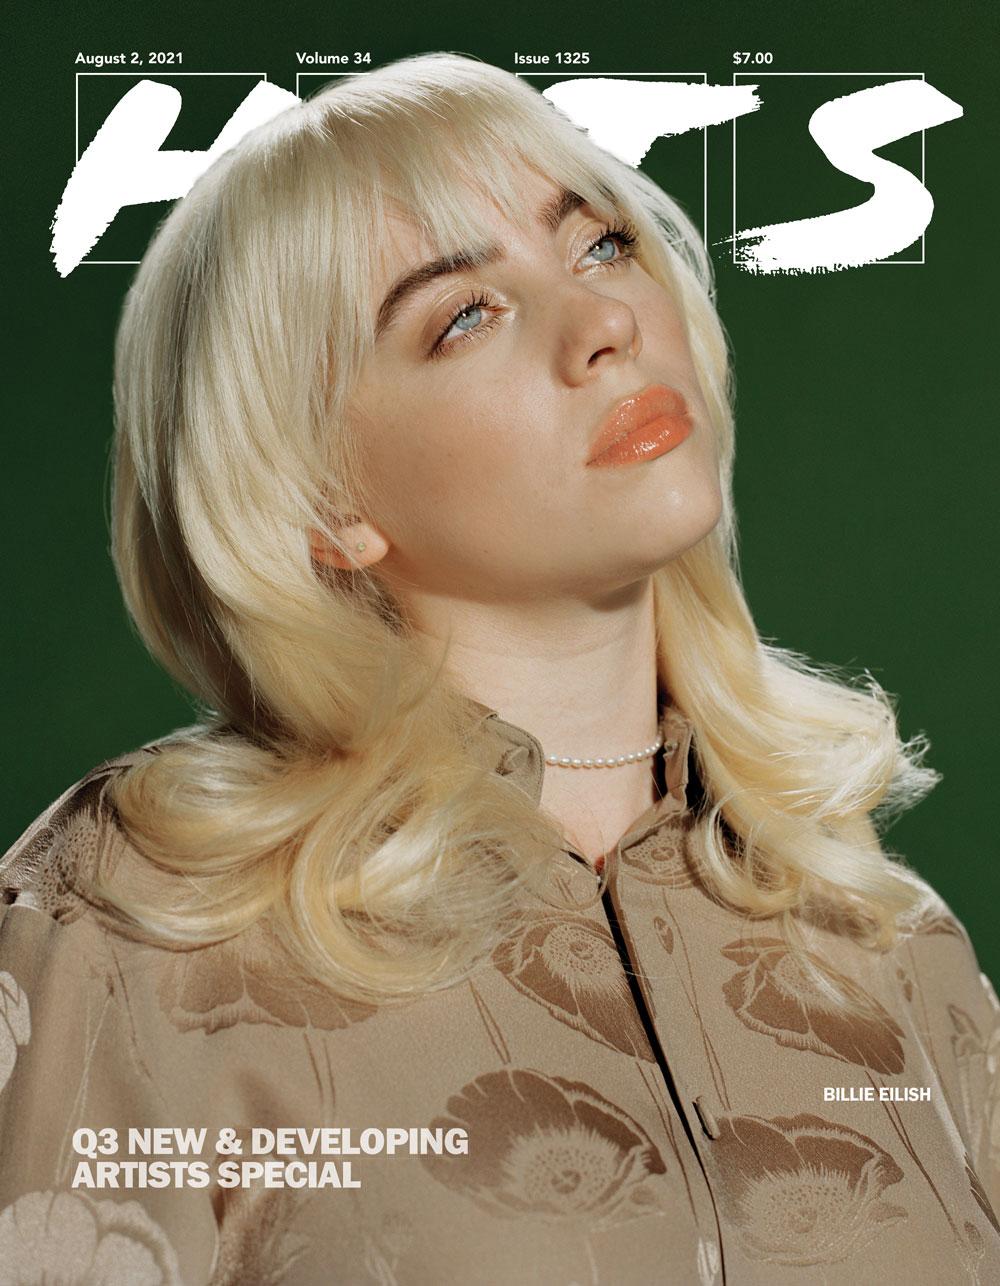 Cover-1325 Billie-Eilish 1